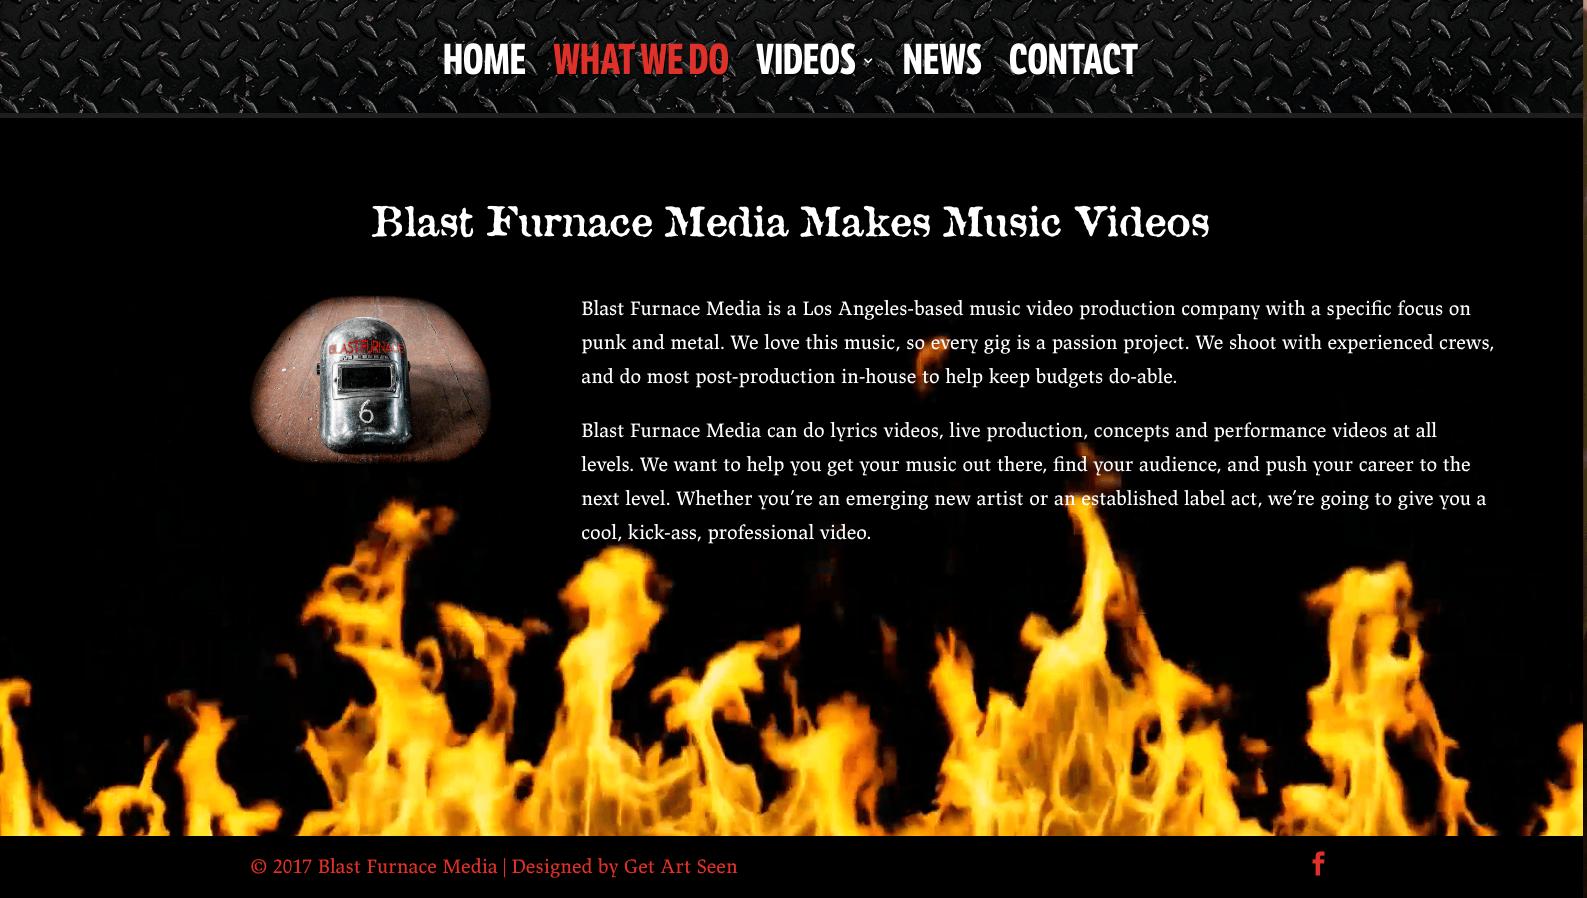 Blast Furnace Media